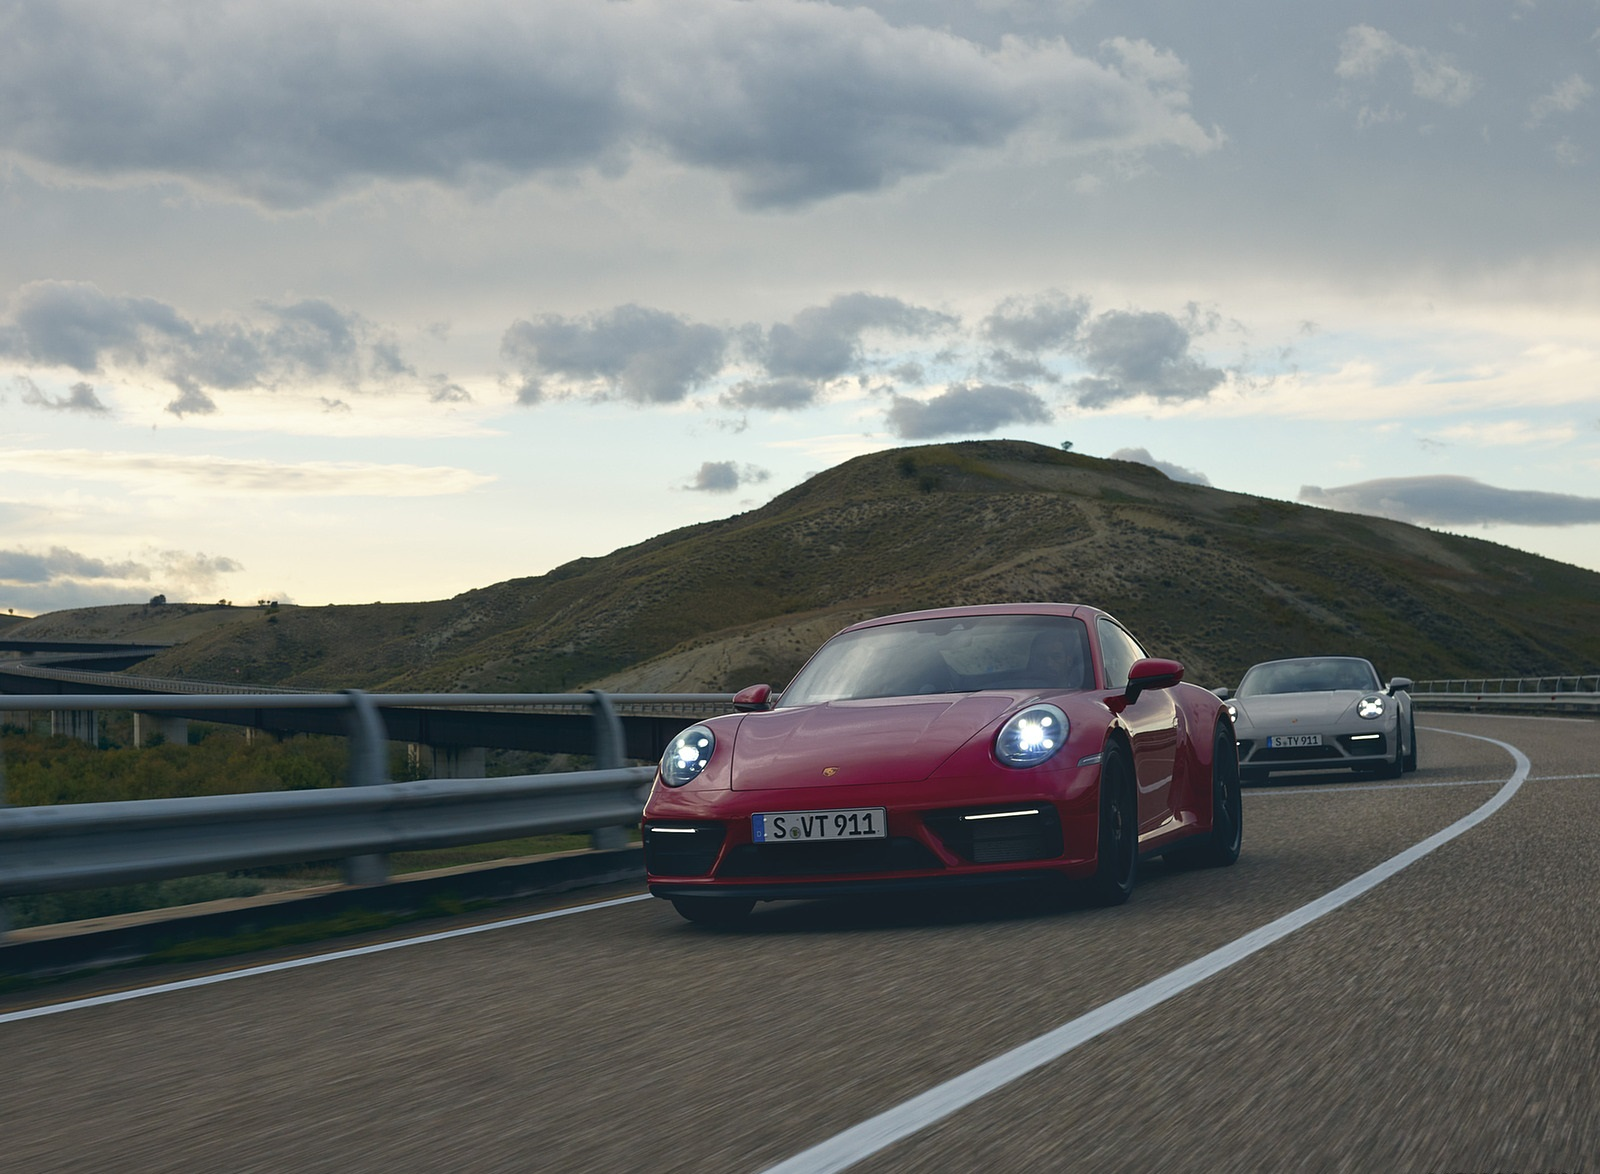 2022 Porsche 911 Targa 4 GTS and 911 Carrera GTS Front Wallpapers (9)